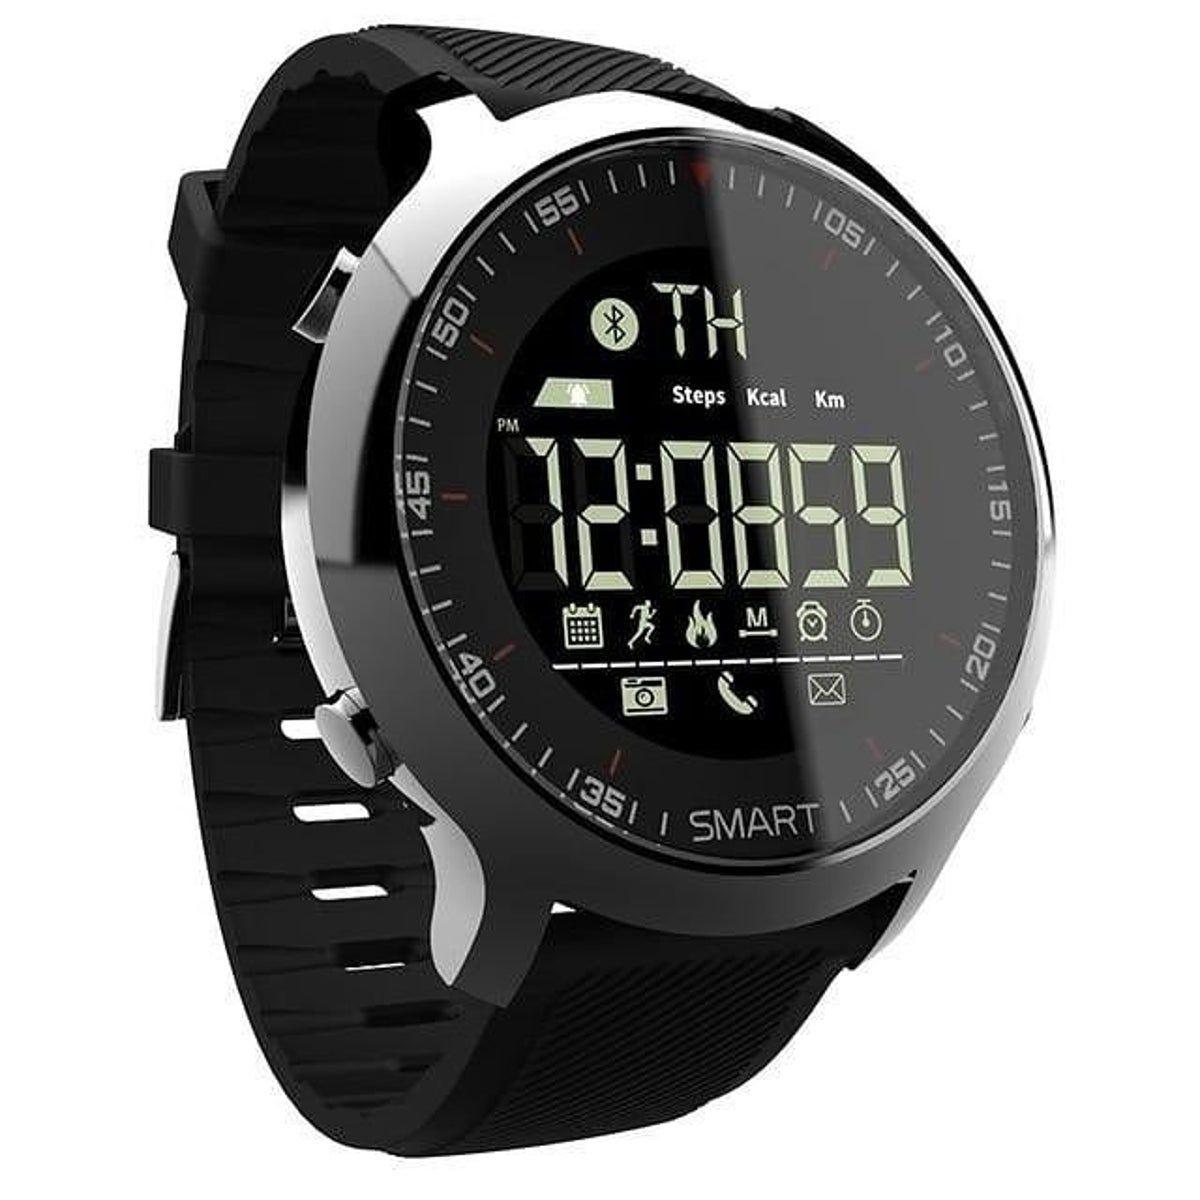 Ip68 Waterproof Rating Watches For Men Smartwatch Wearables Coole Uhren